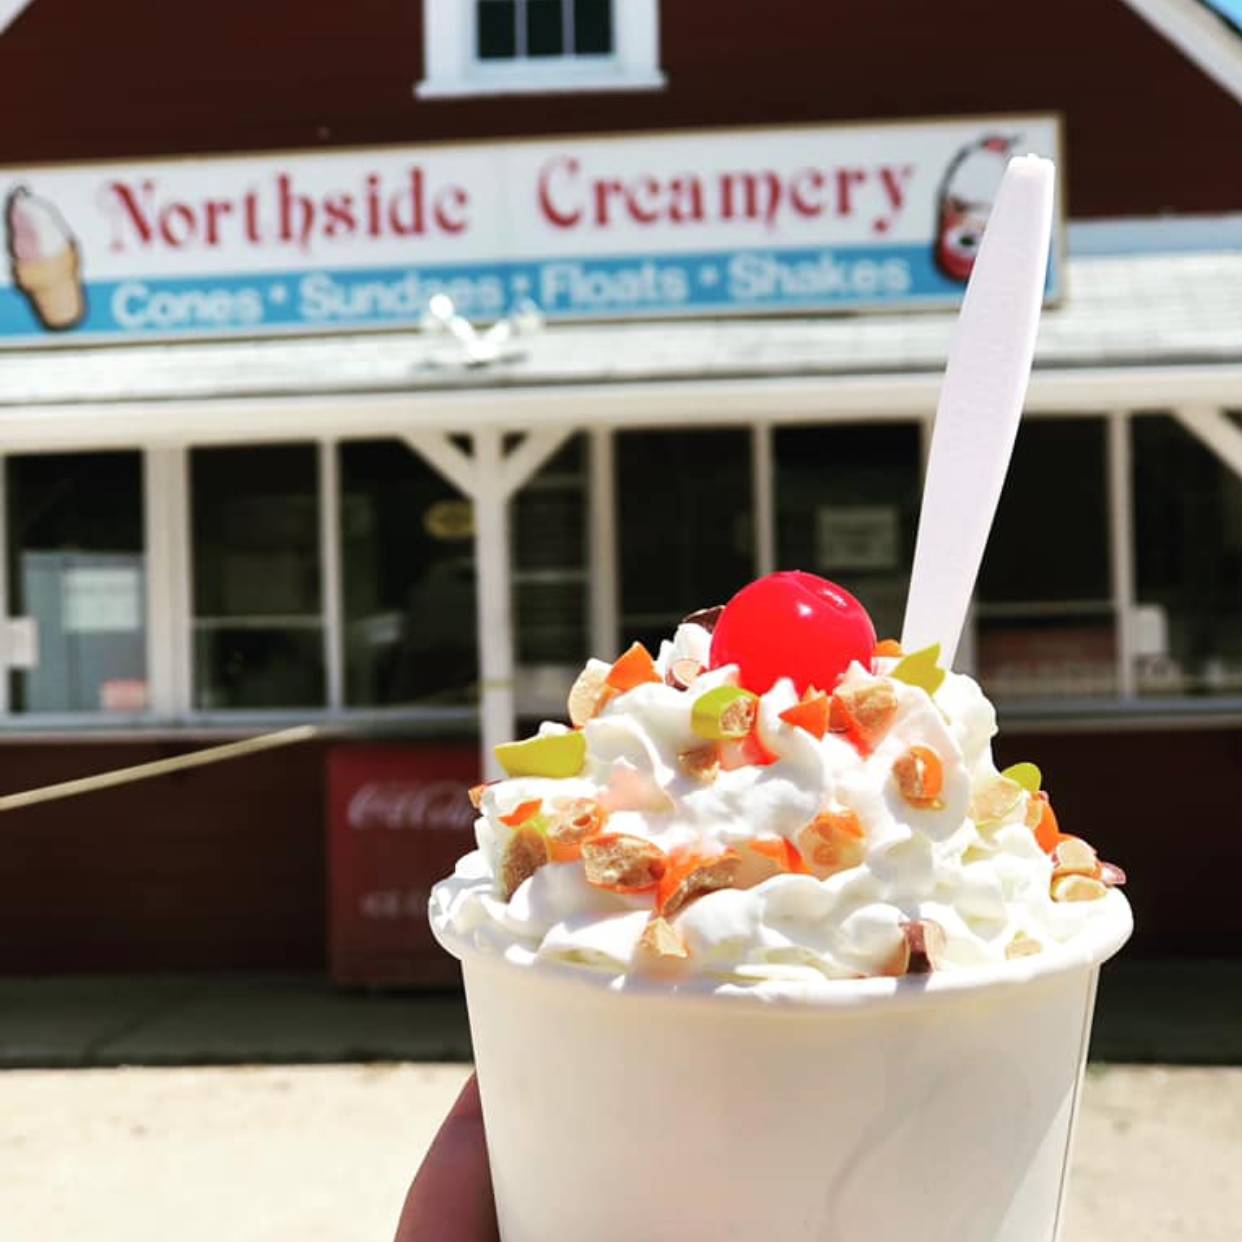 Northside Creamery